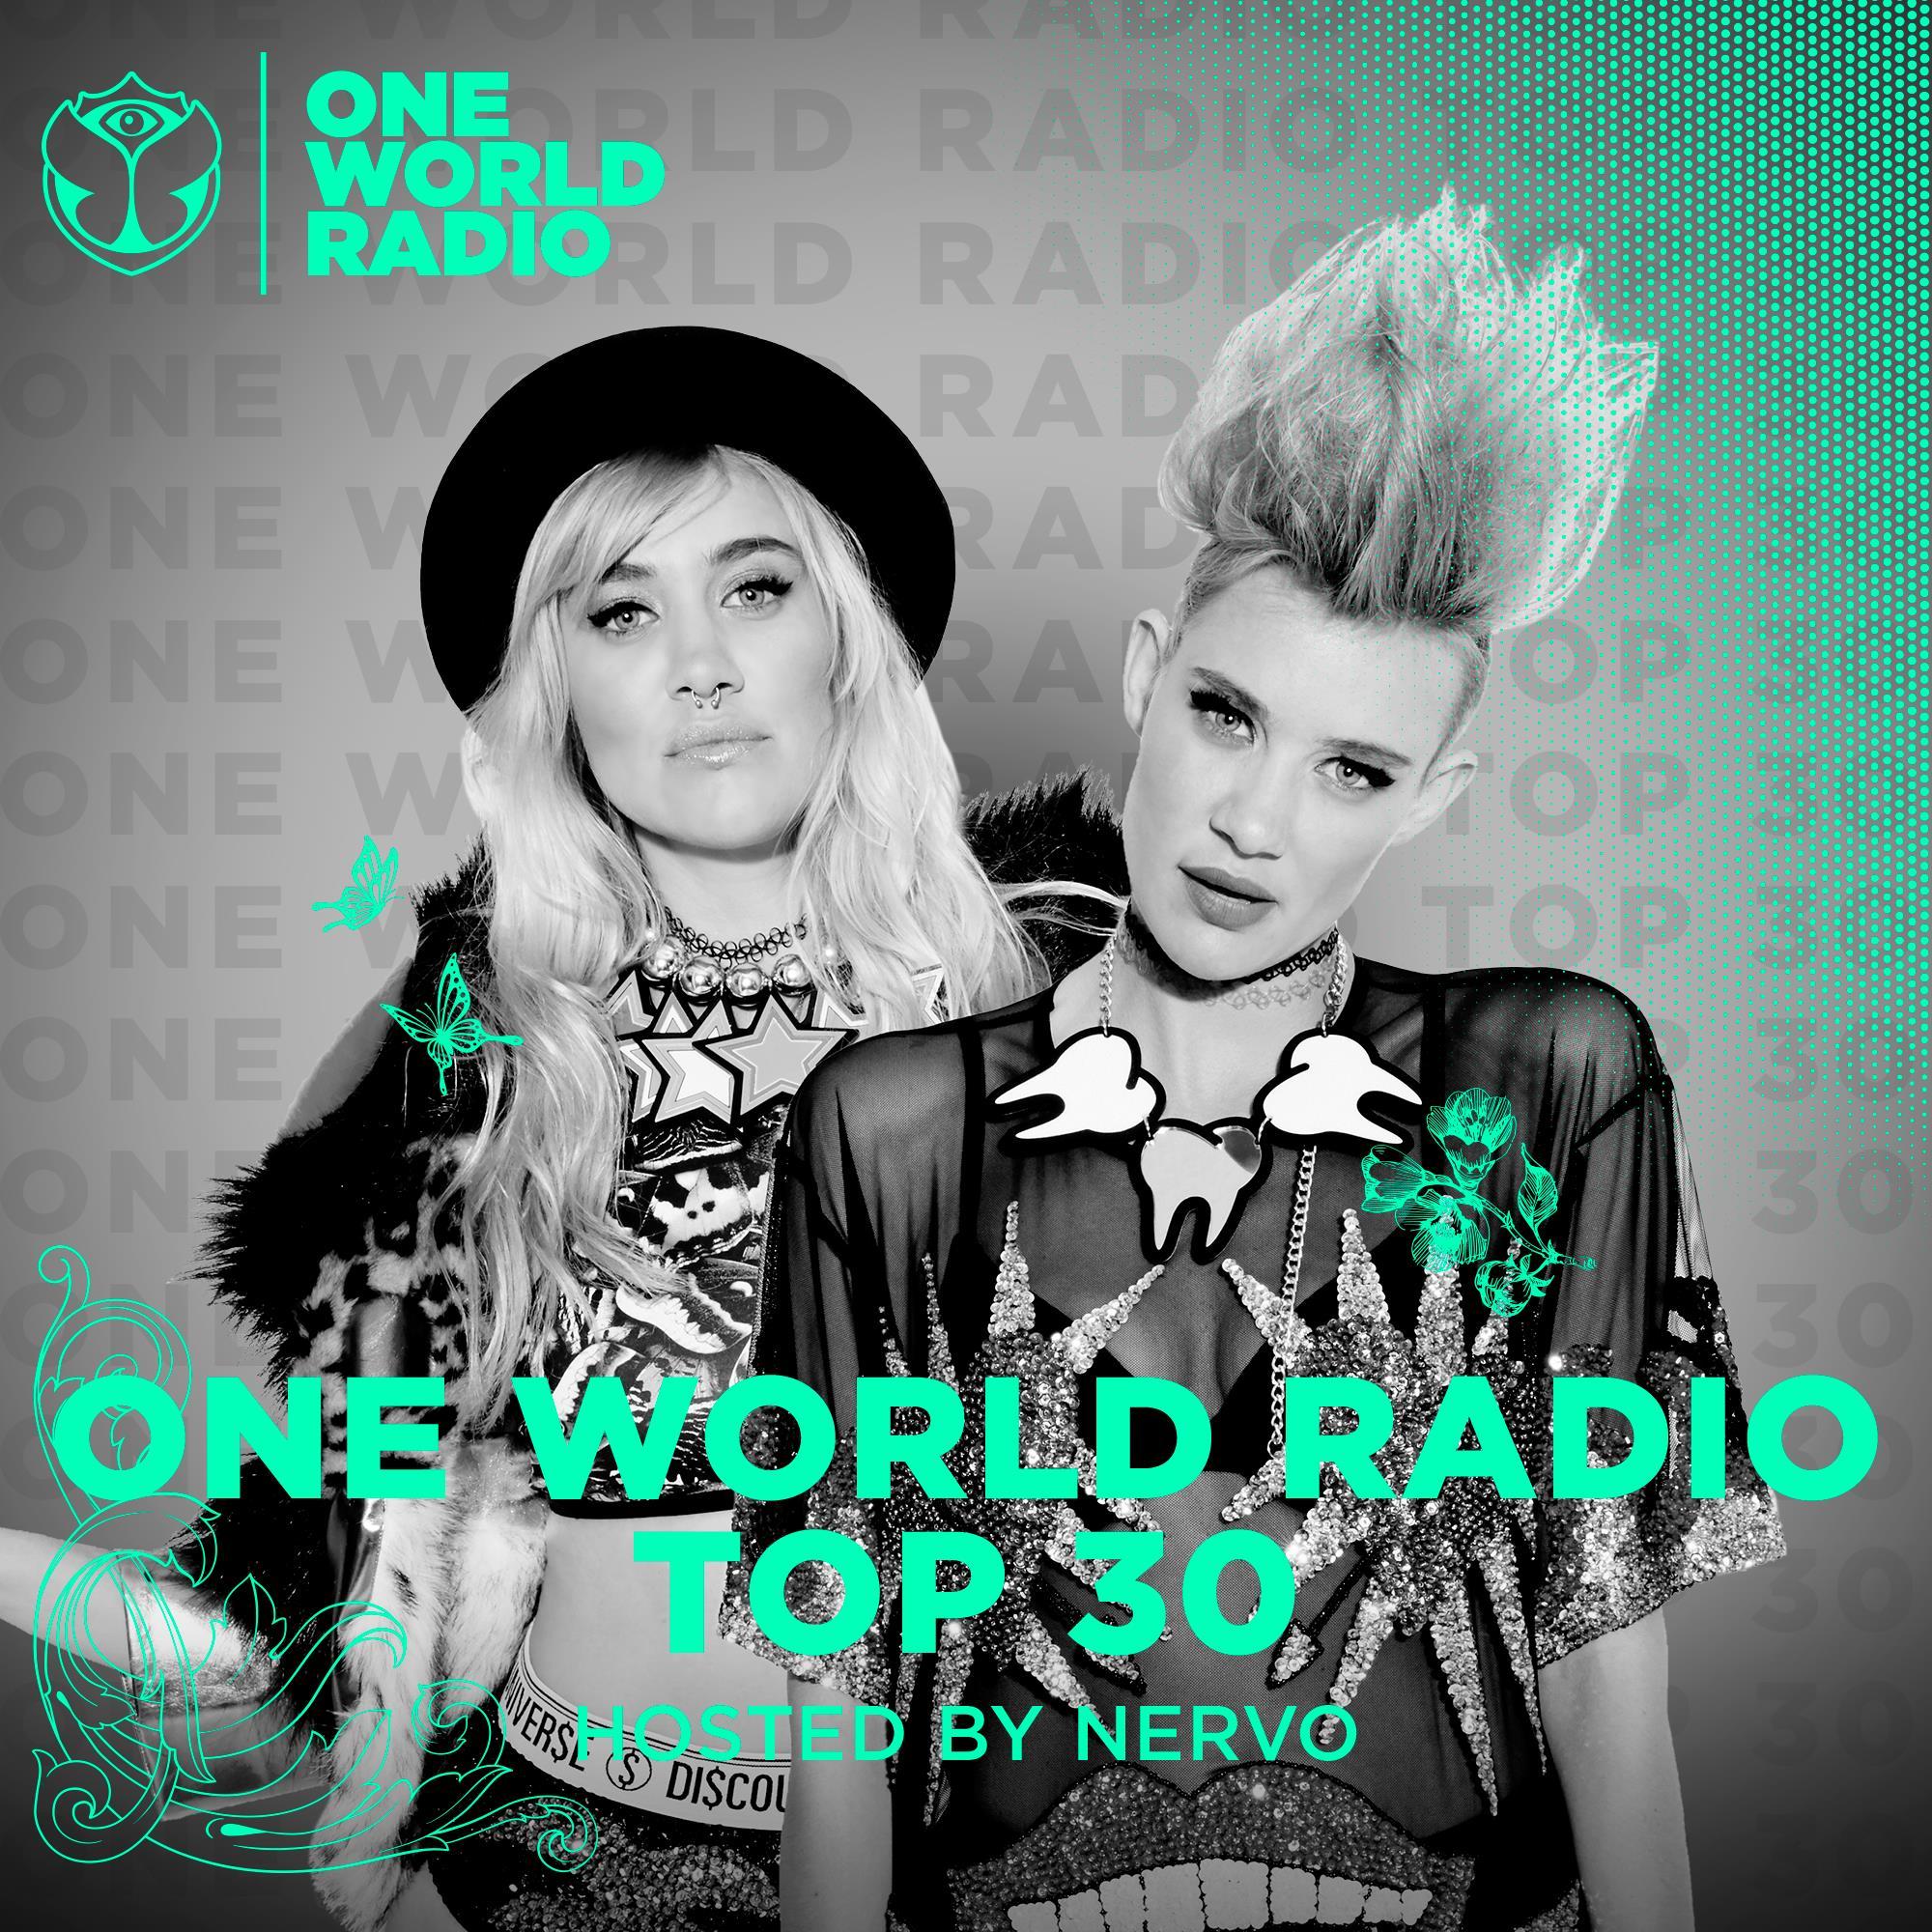 nervo one world radio